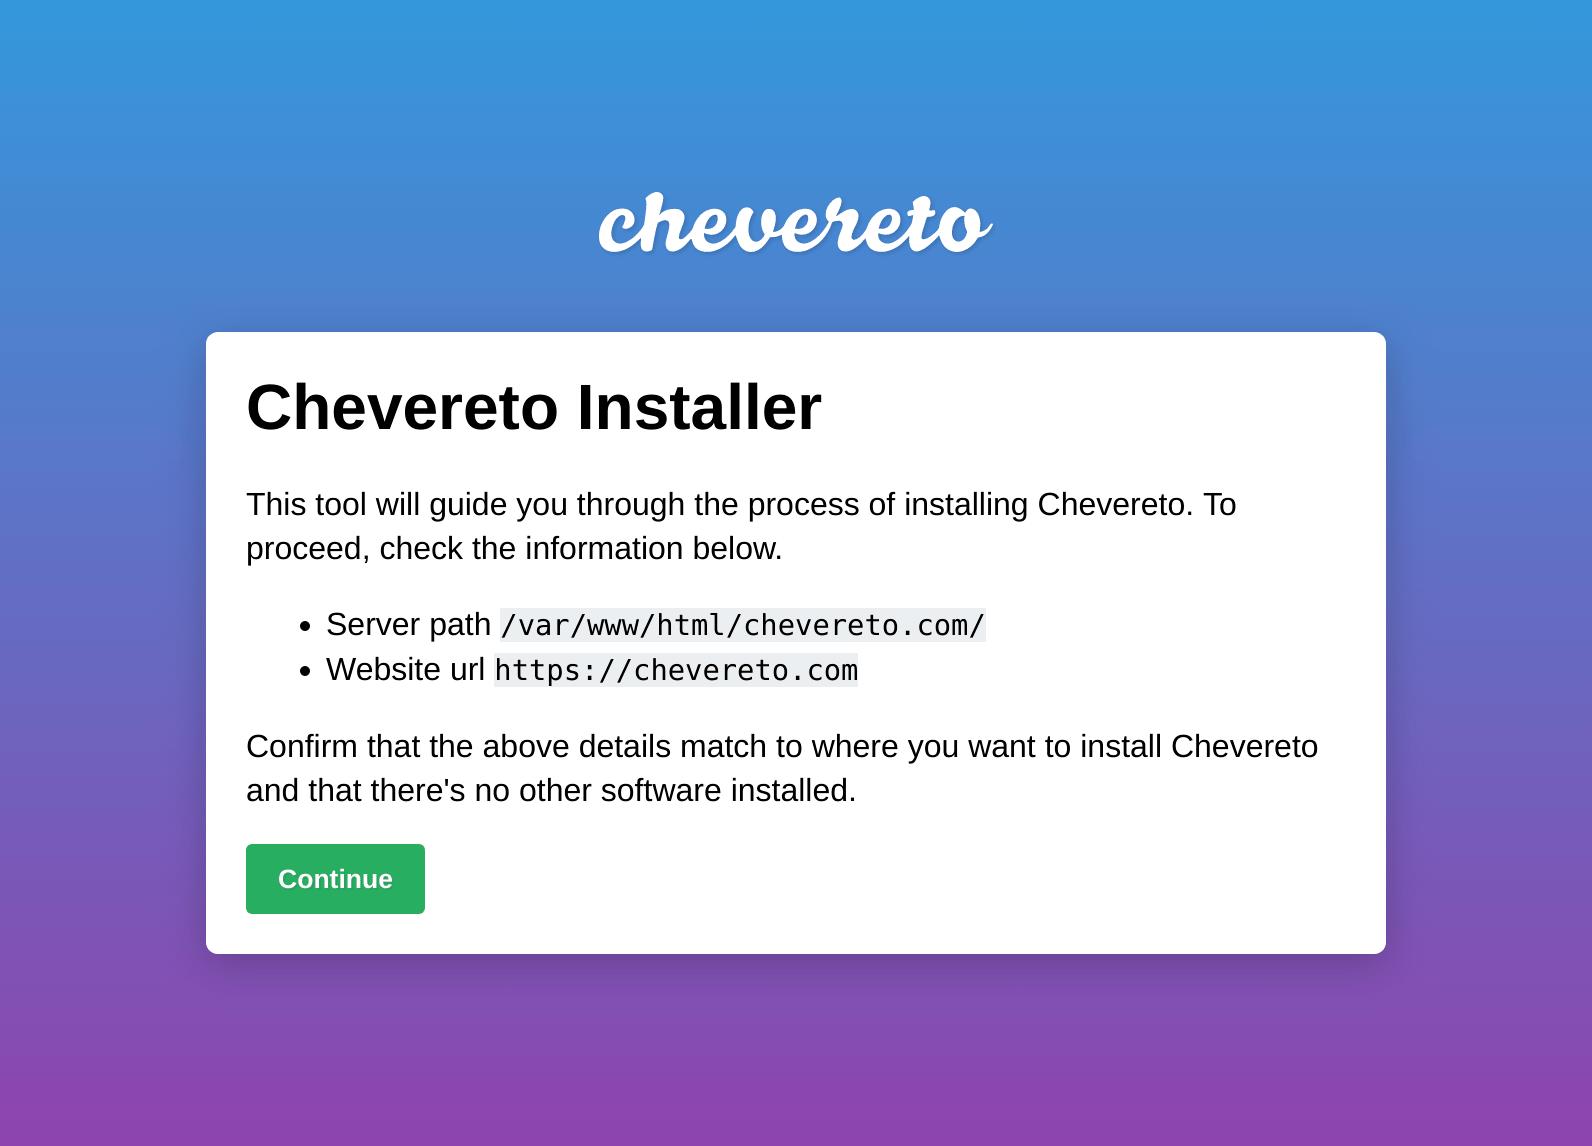 Chevereto Installer